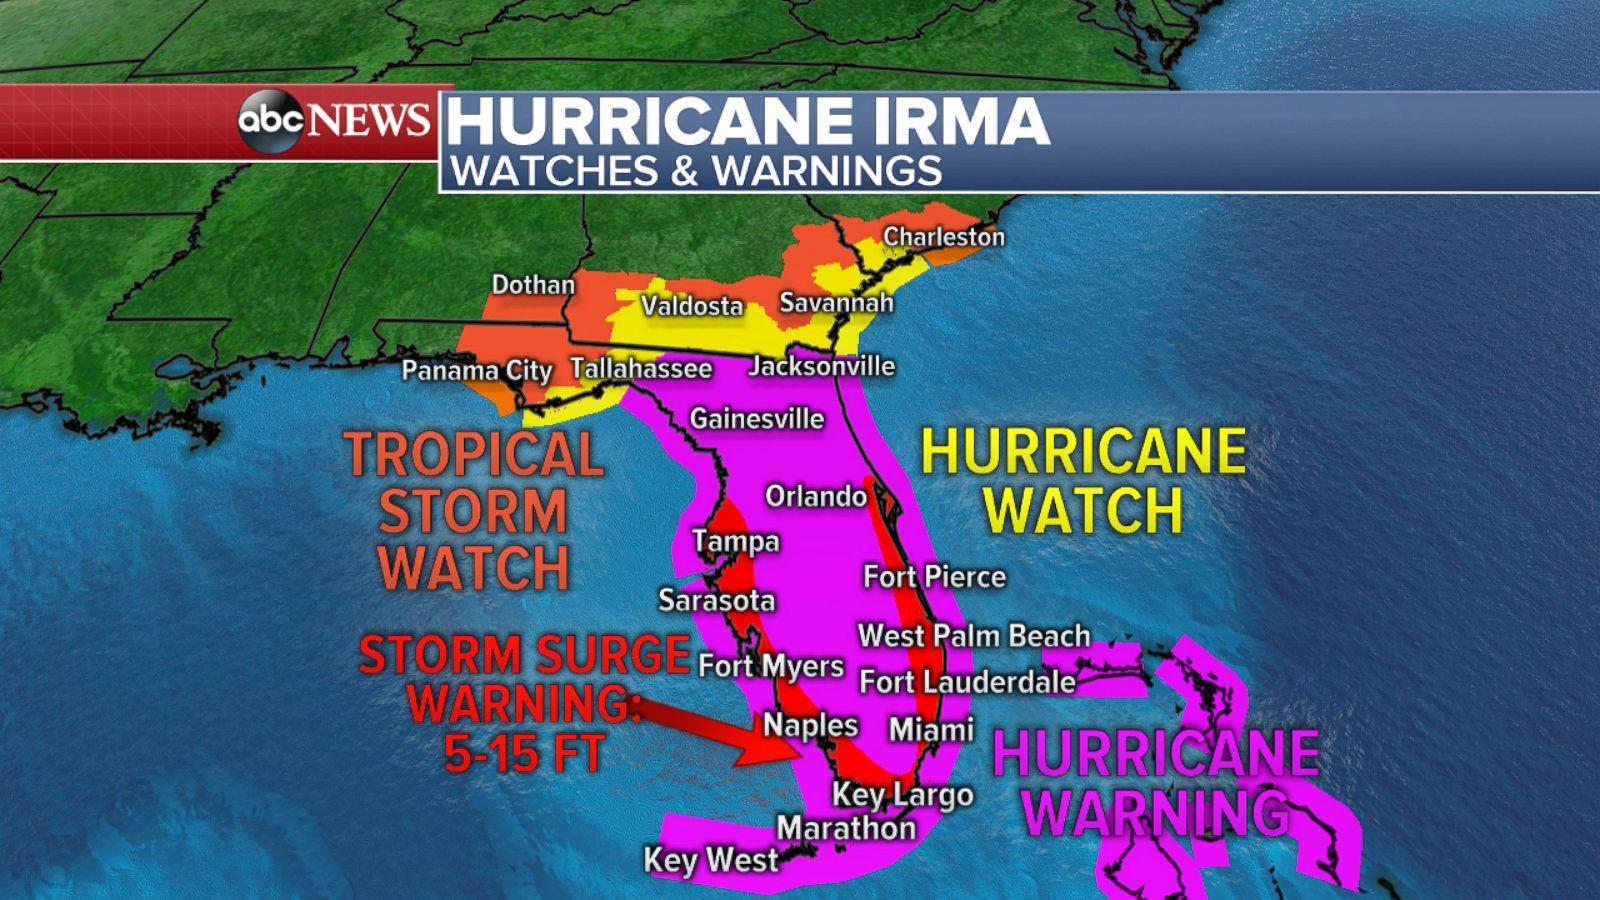 Watches And Warnings Map PHOTO: Hurricane Irma watches and warnings map.   ABC News Watches And Warnings Map